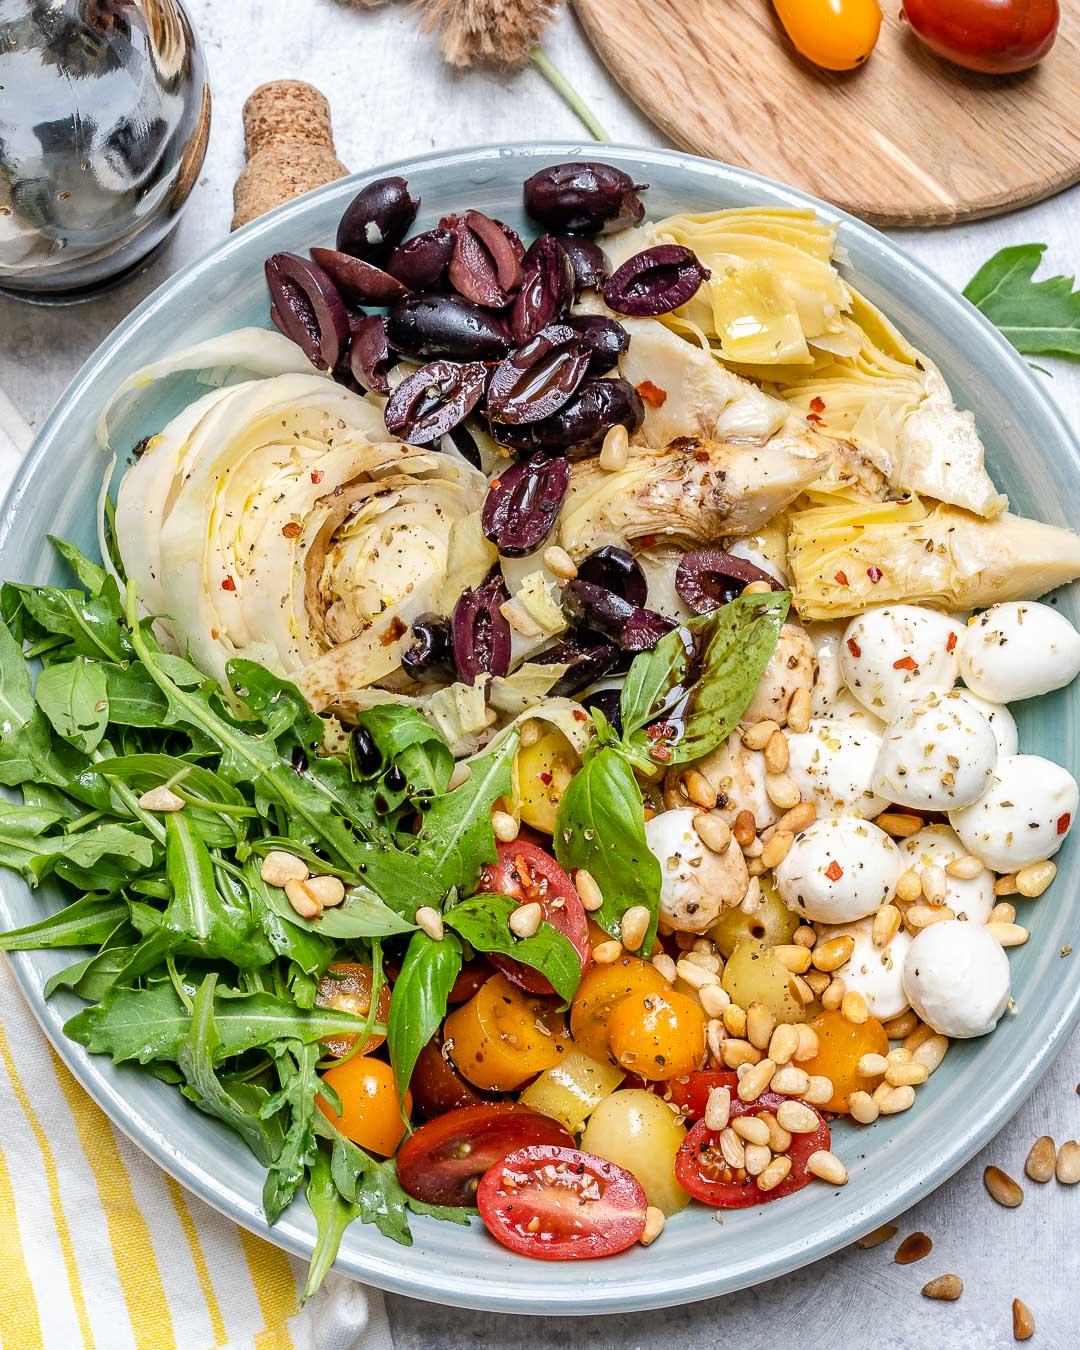 Mediterranean-Style Chopped Salad